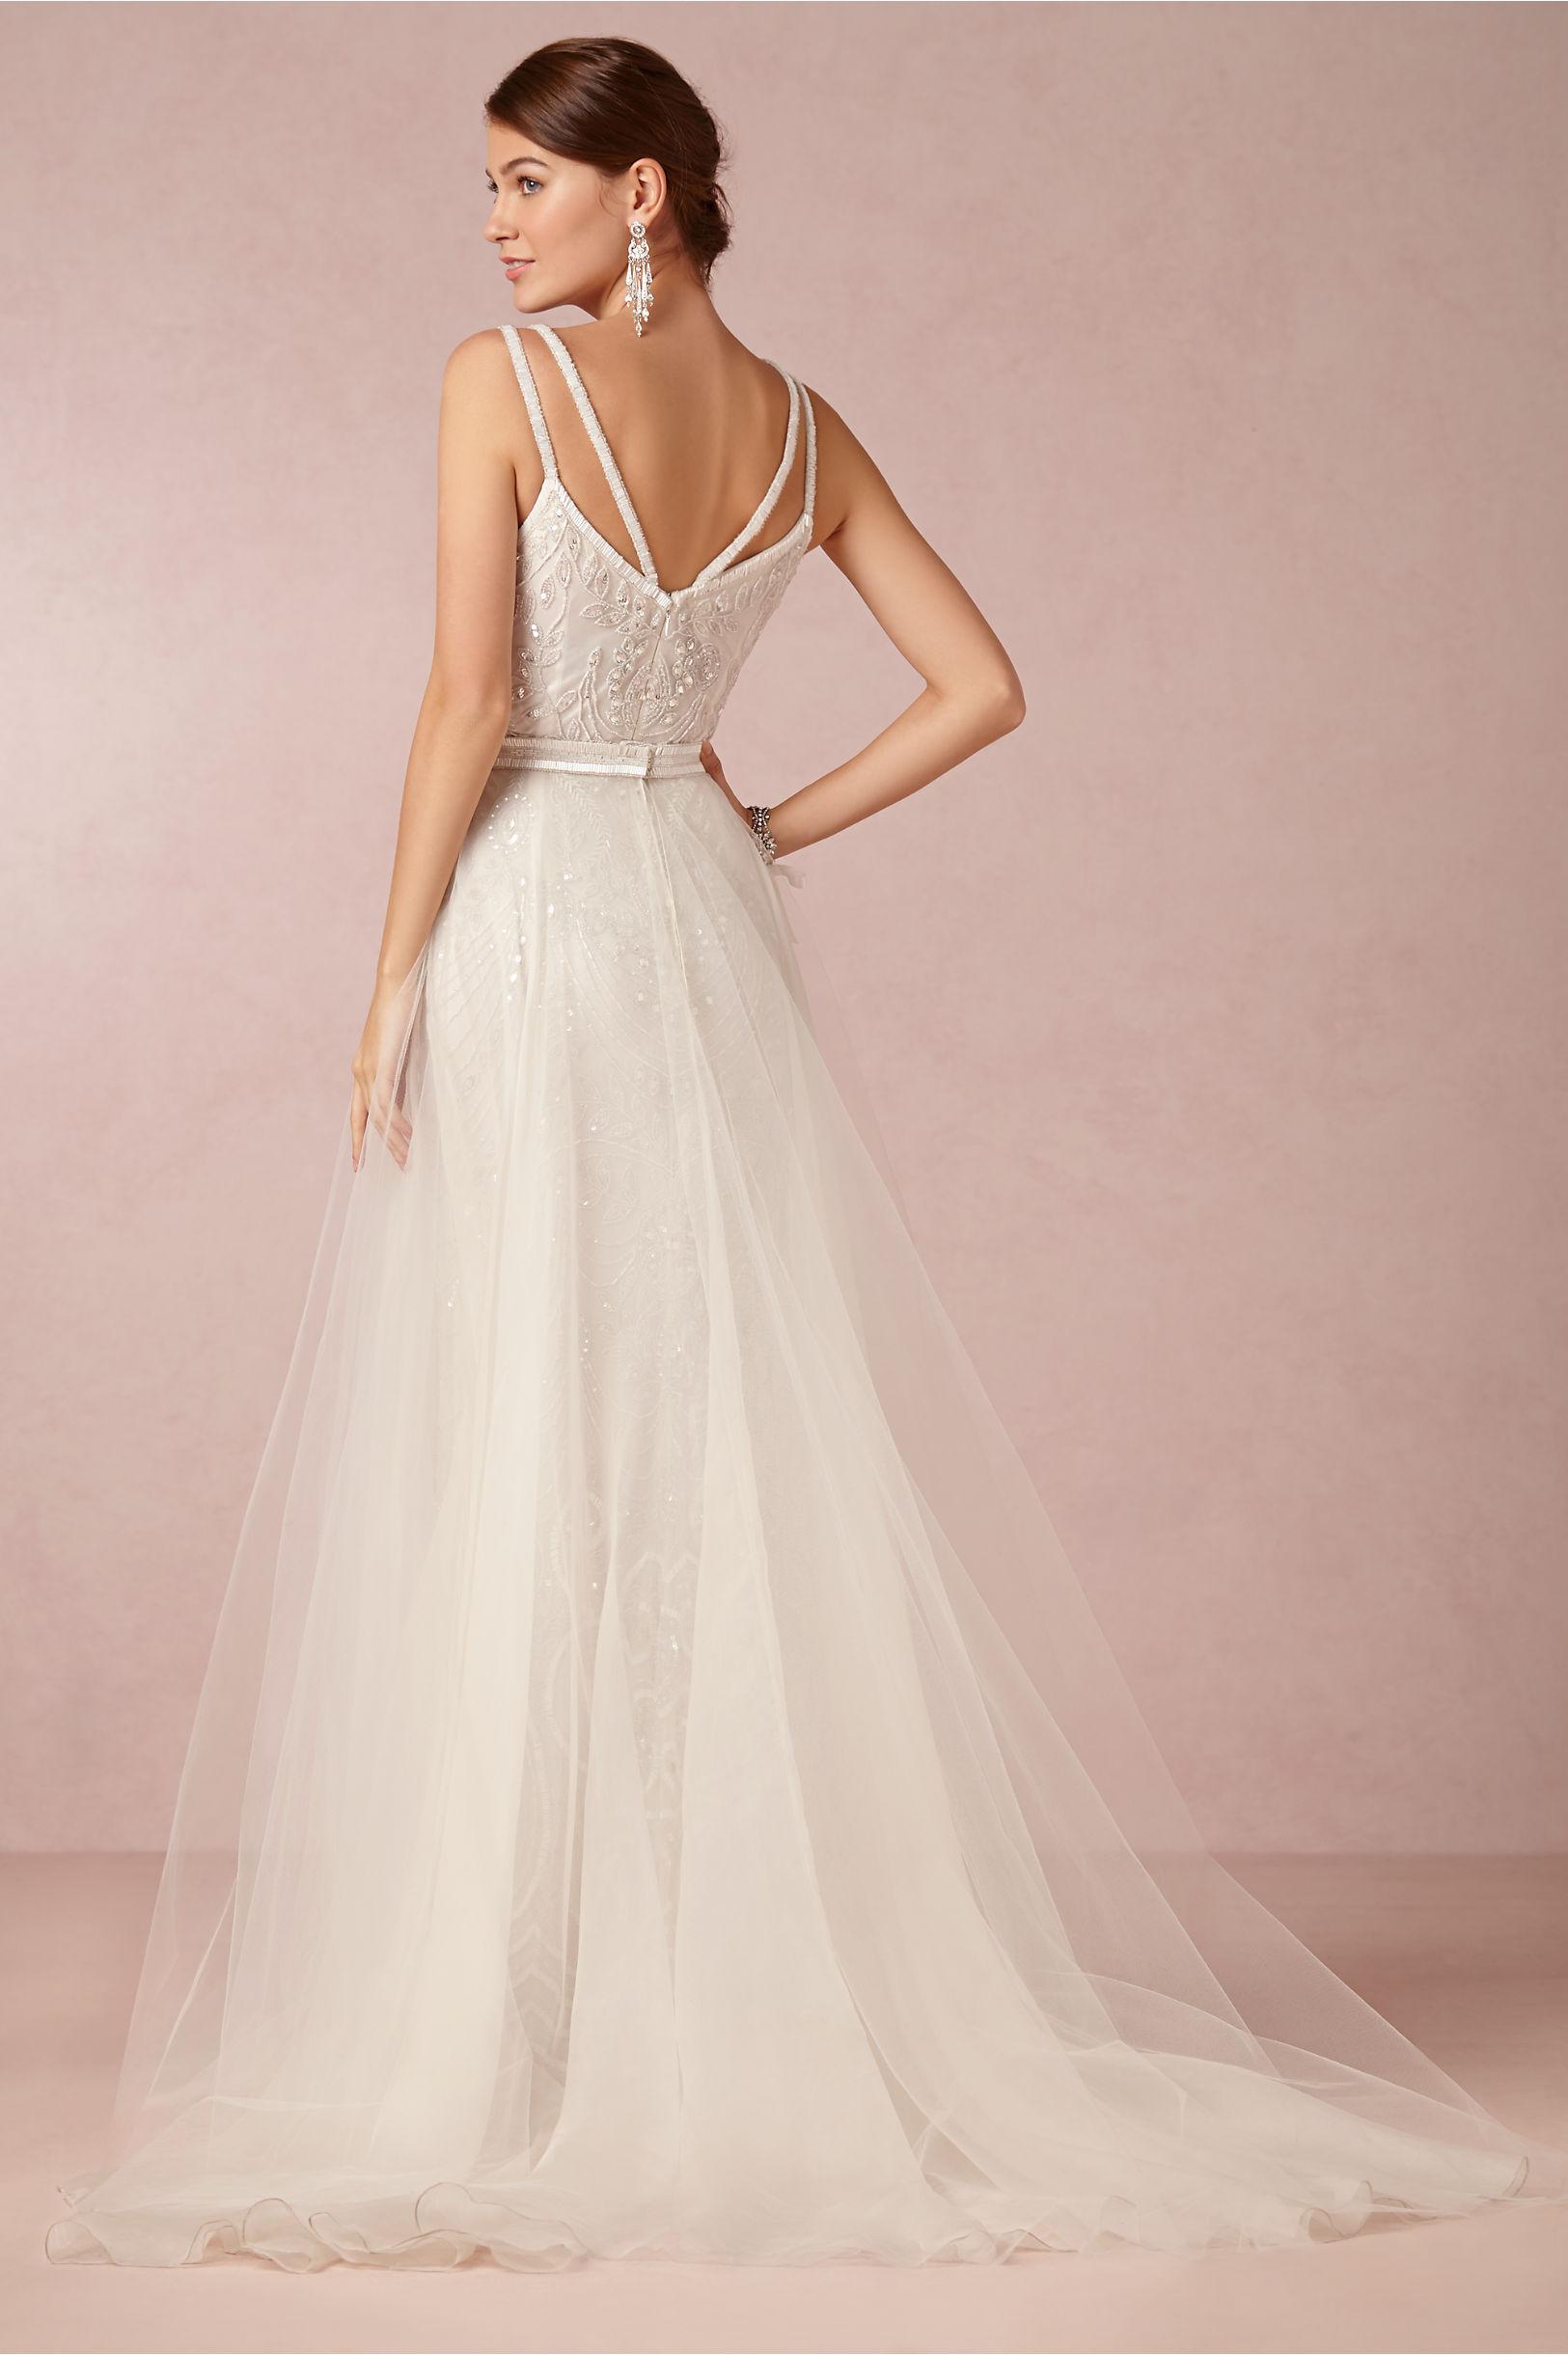 Elsa Wedding Gowns – fashion dresses